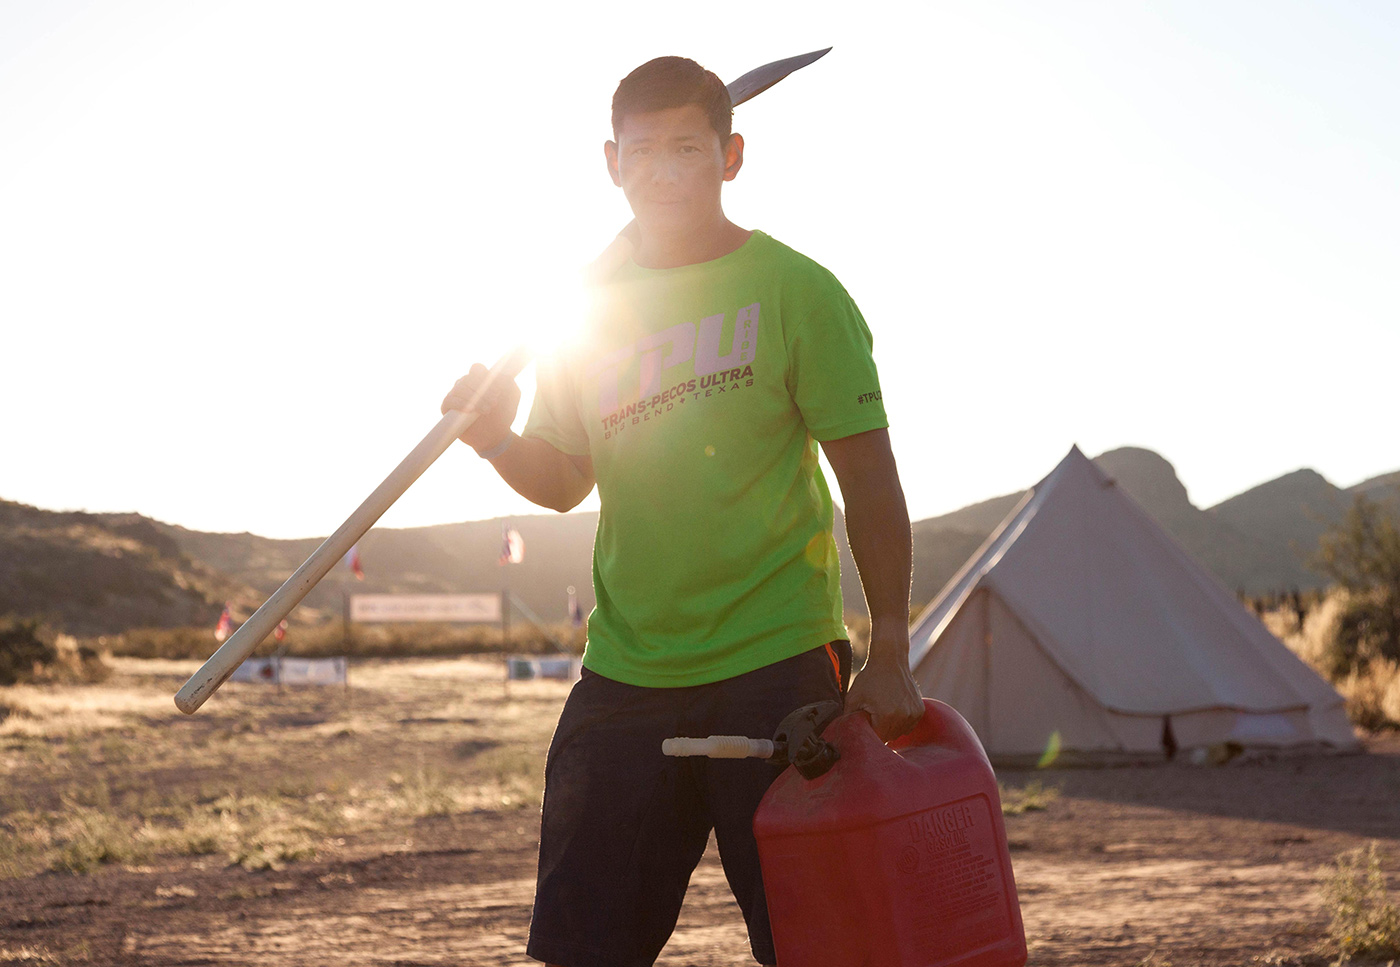 Trans-Pecos-Ultra-ABP-Adrian_Stage-5-Camp.jpg